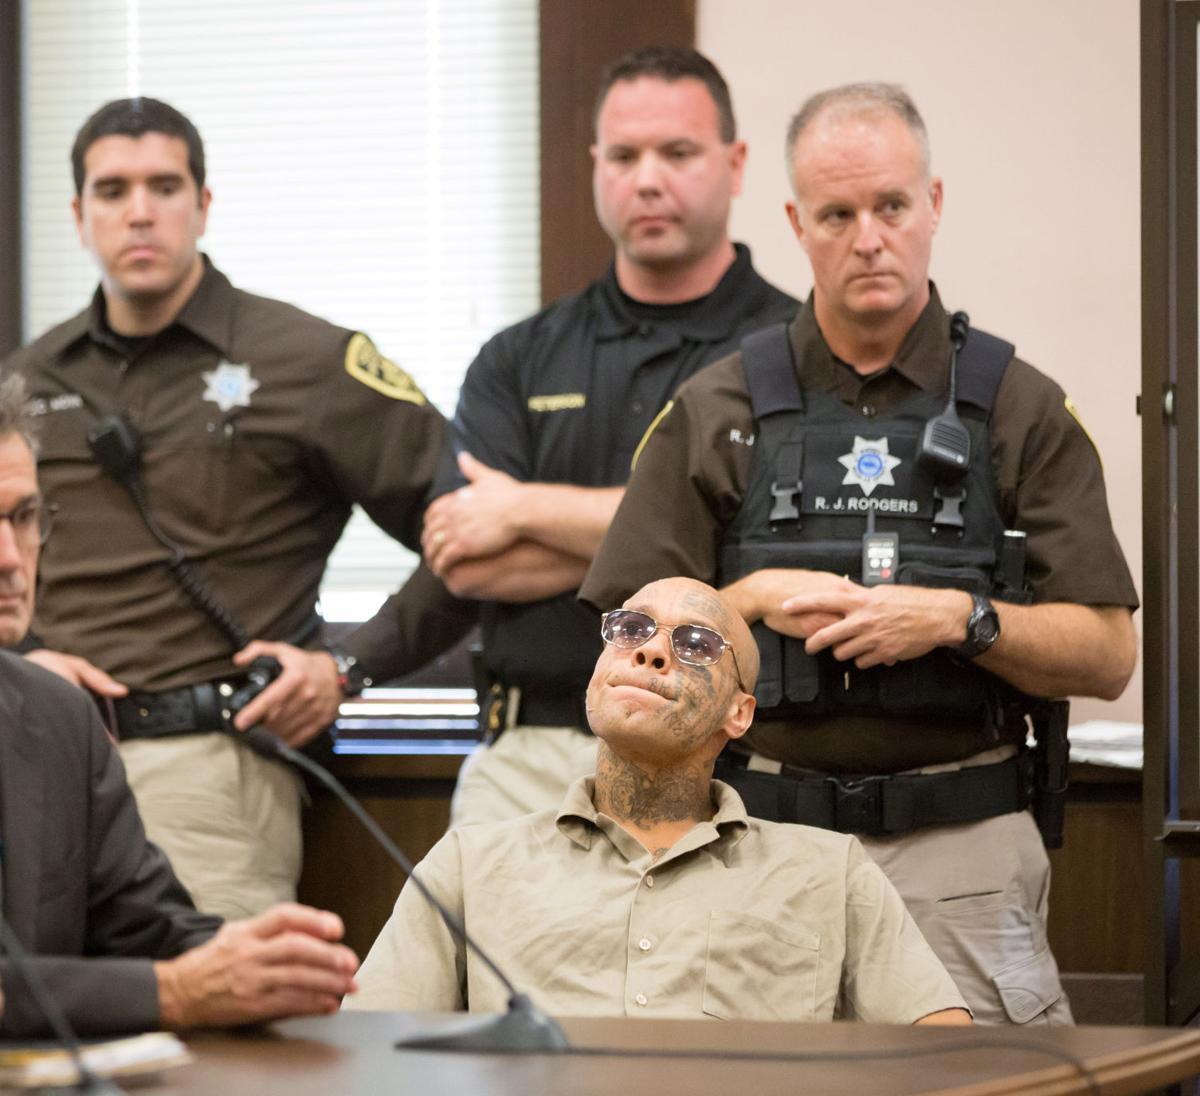 Nikko Jenkins at sentencing